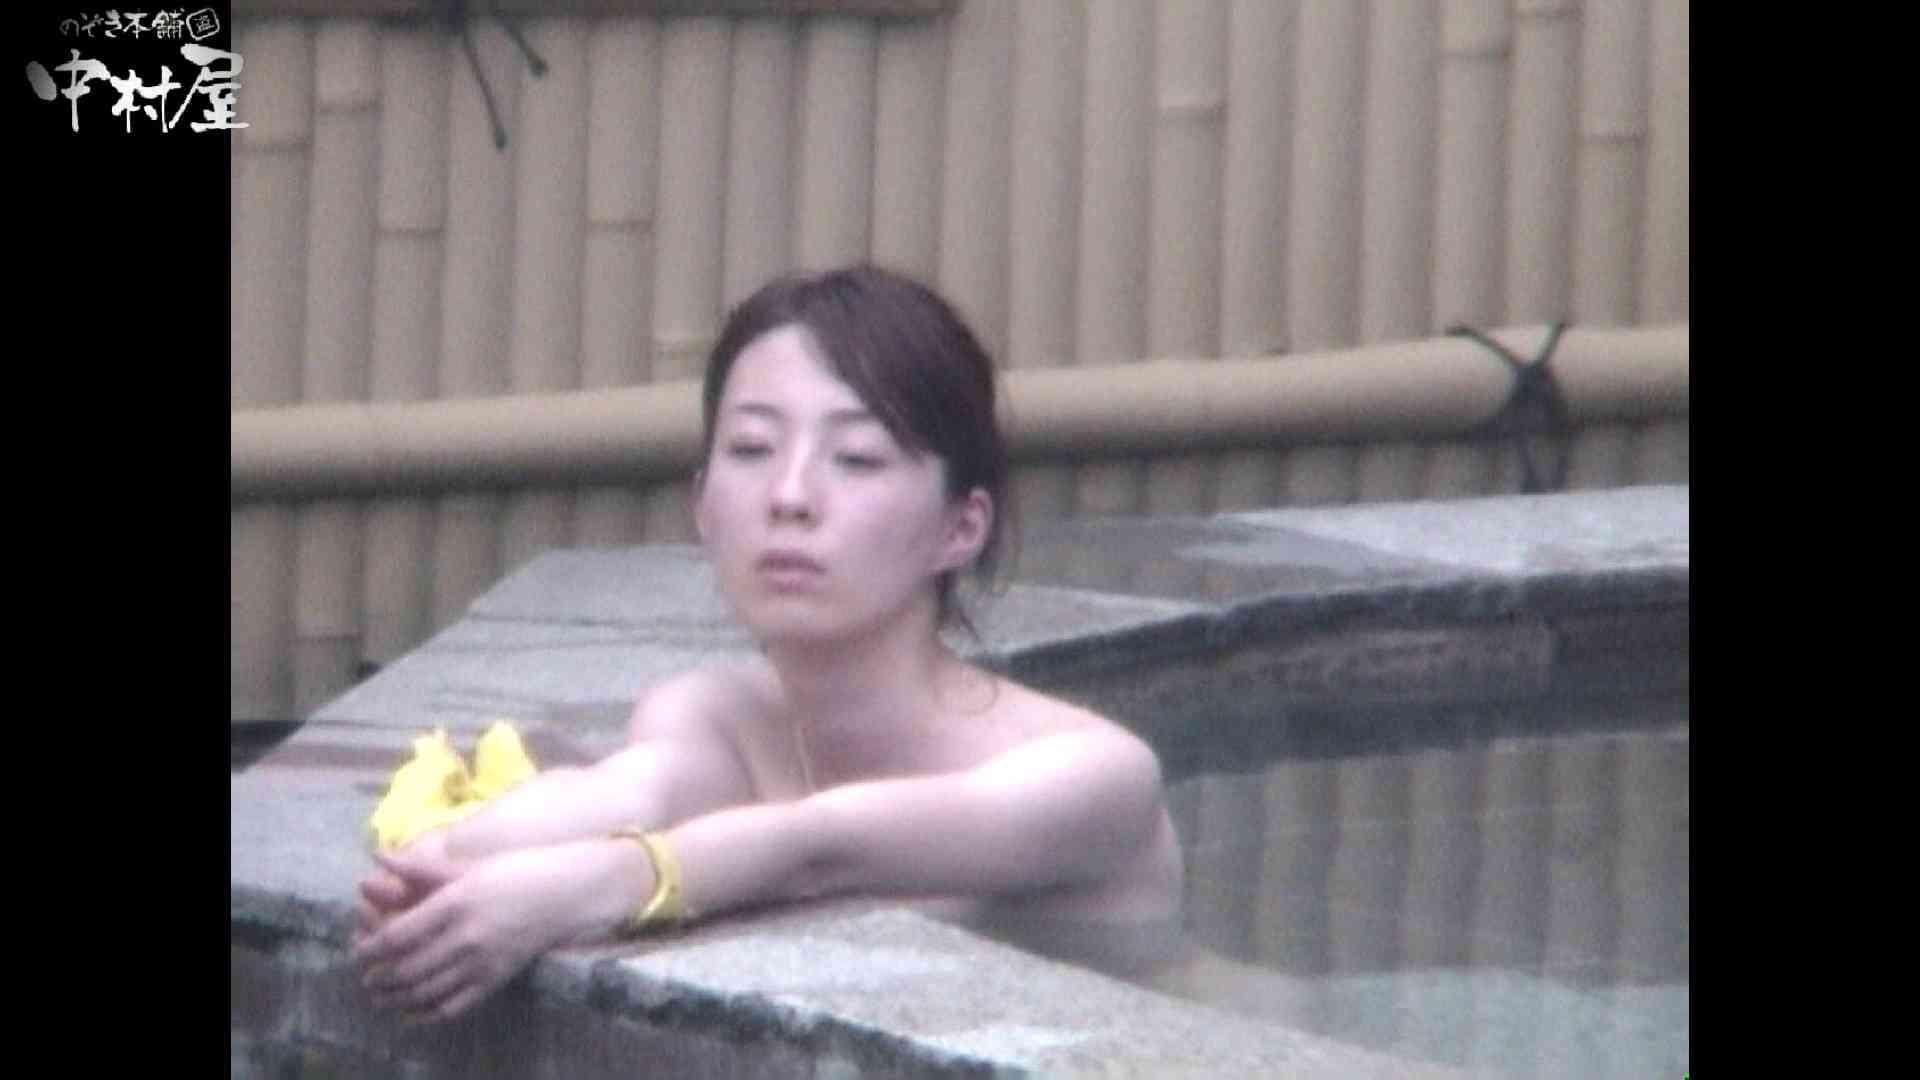 Aquaな露天風呂Vol.964 綺麗なOLたち オメコ無修正動画無料 97枚 89